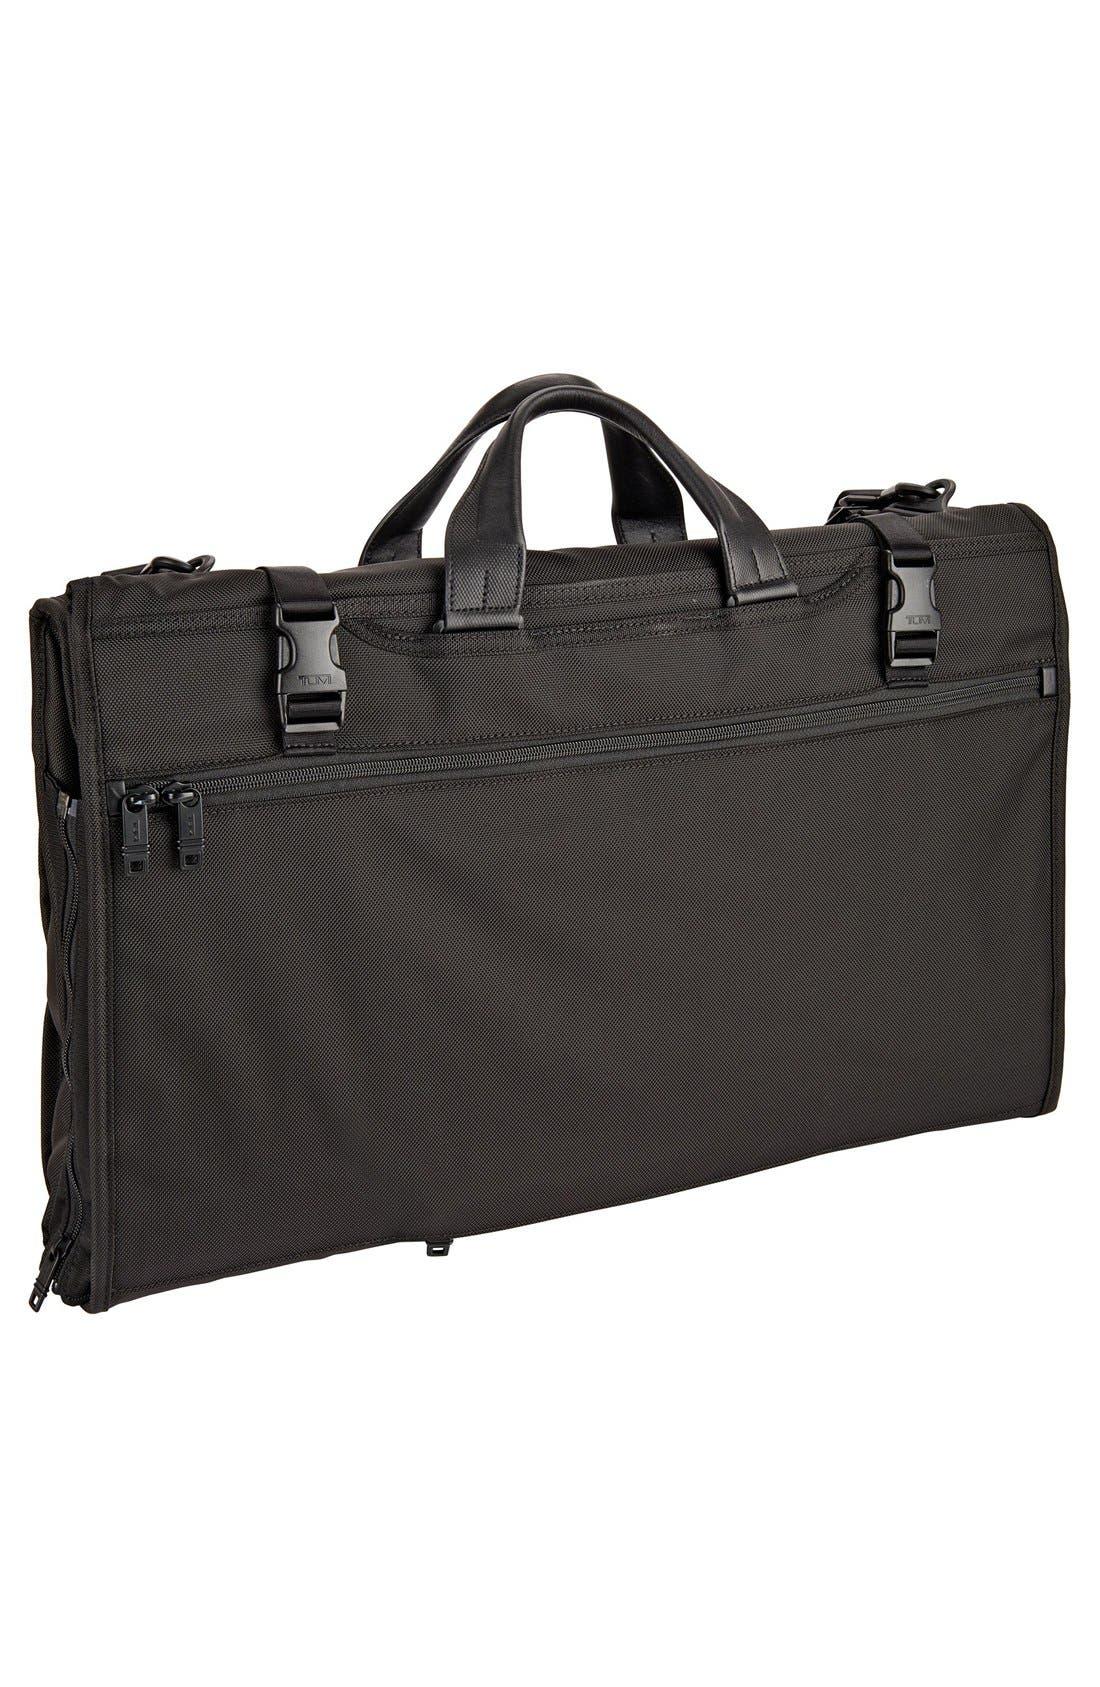 Alpha 2 22-Inch Trifold Carry-On Garment Bag,                             Alternate thumbnail 2, color,                             BLACK